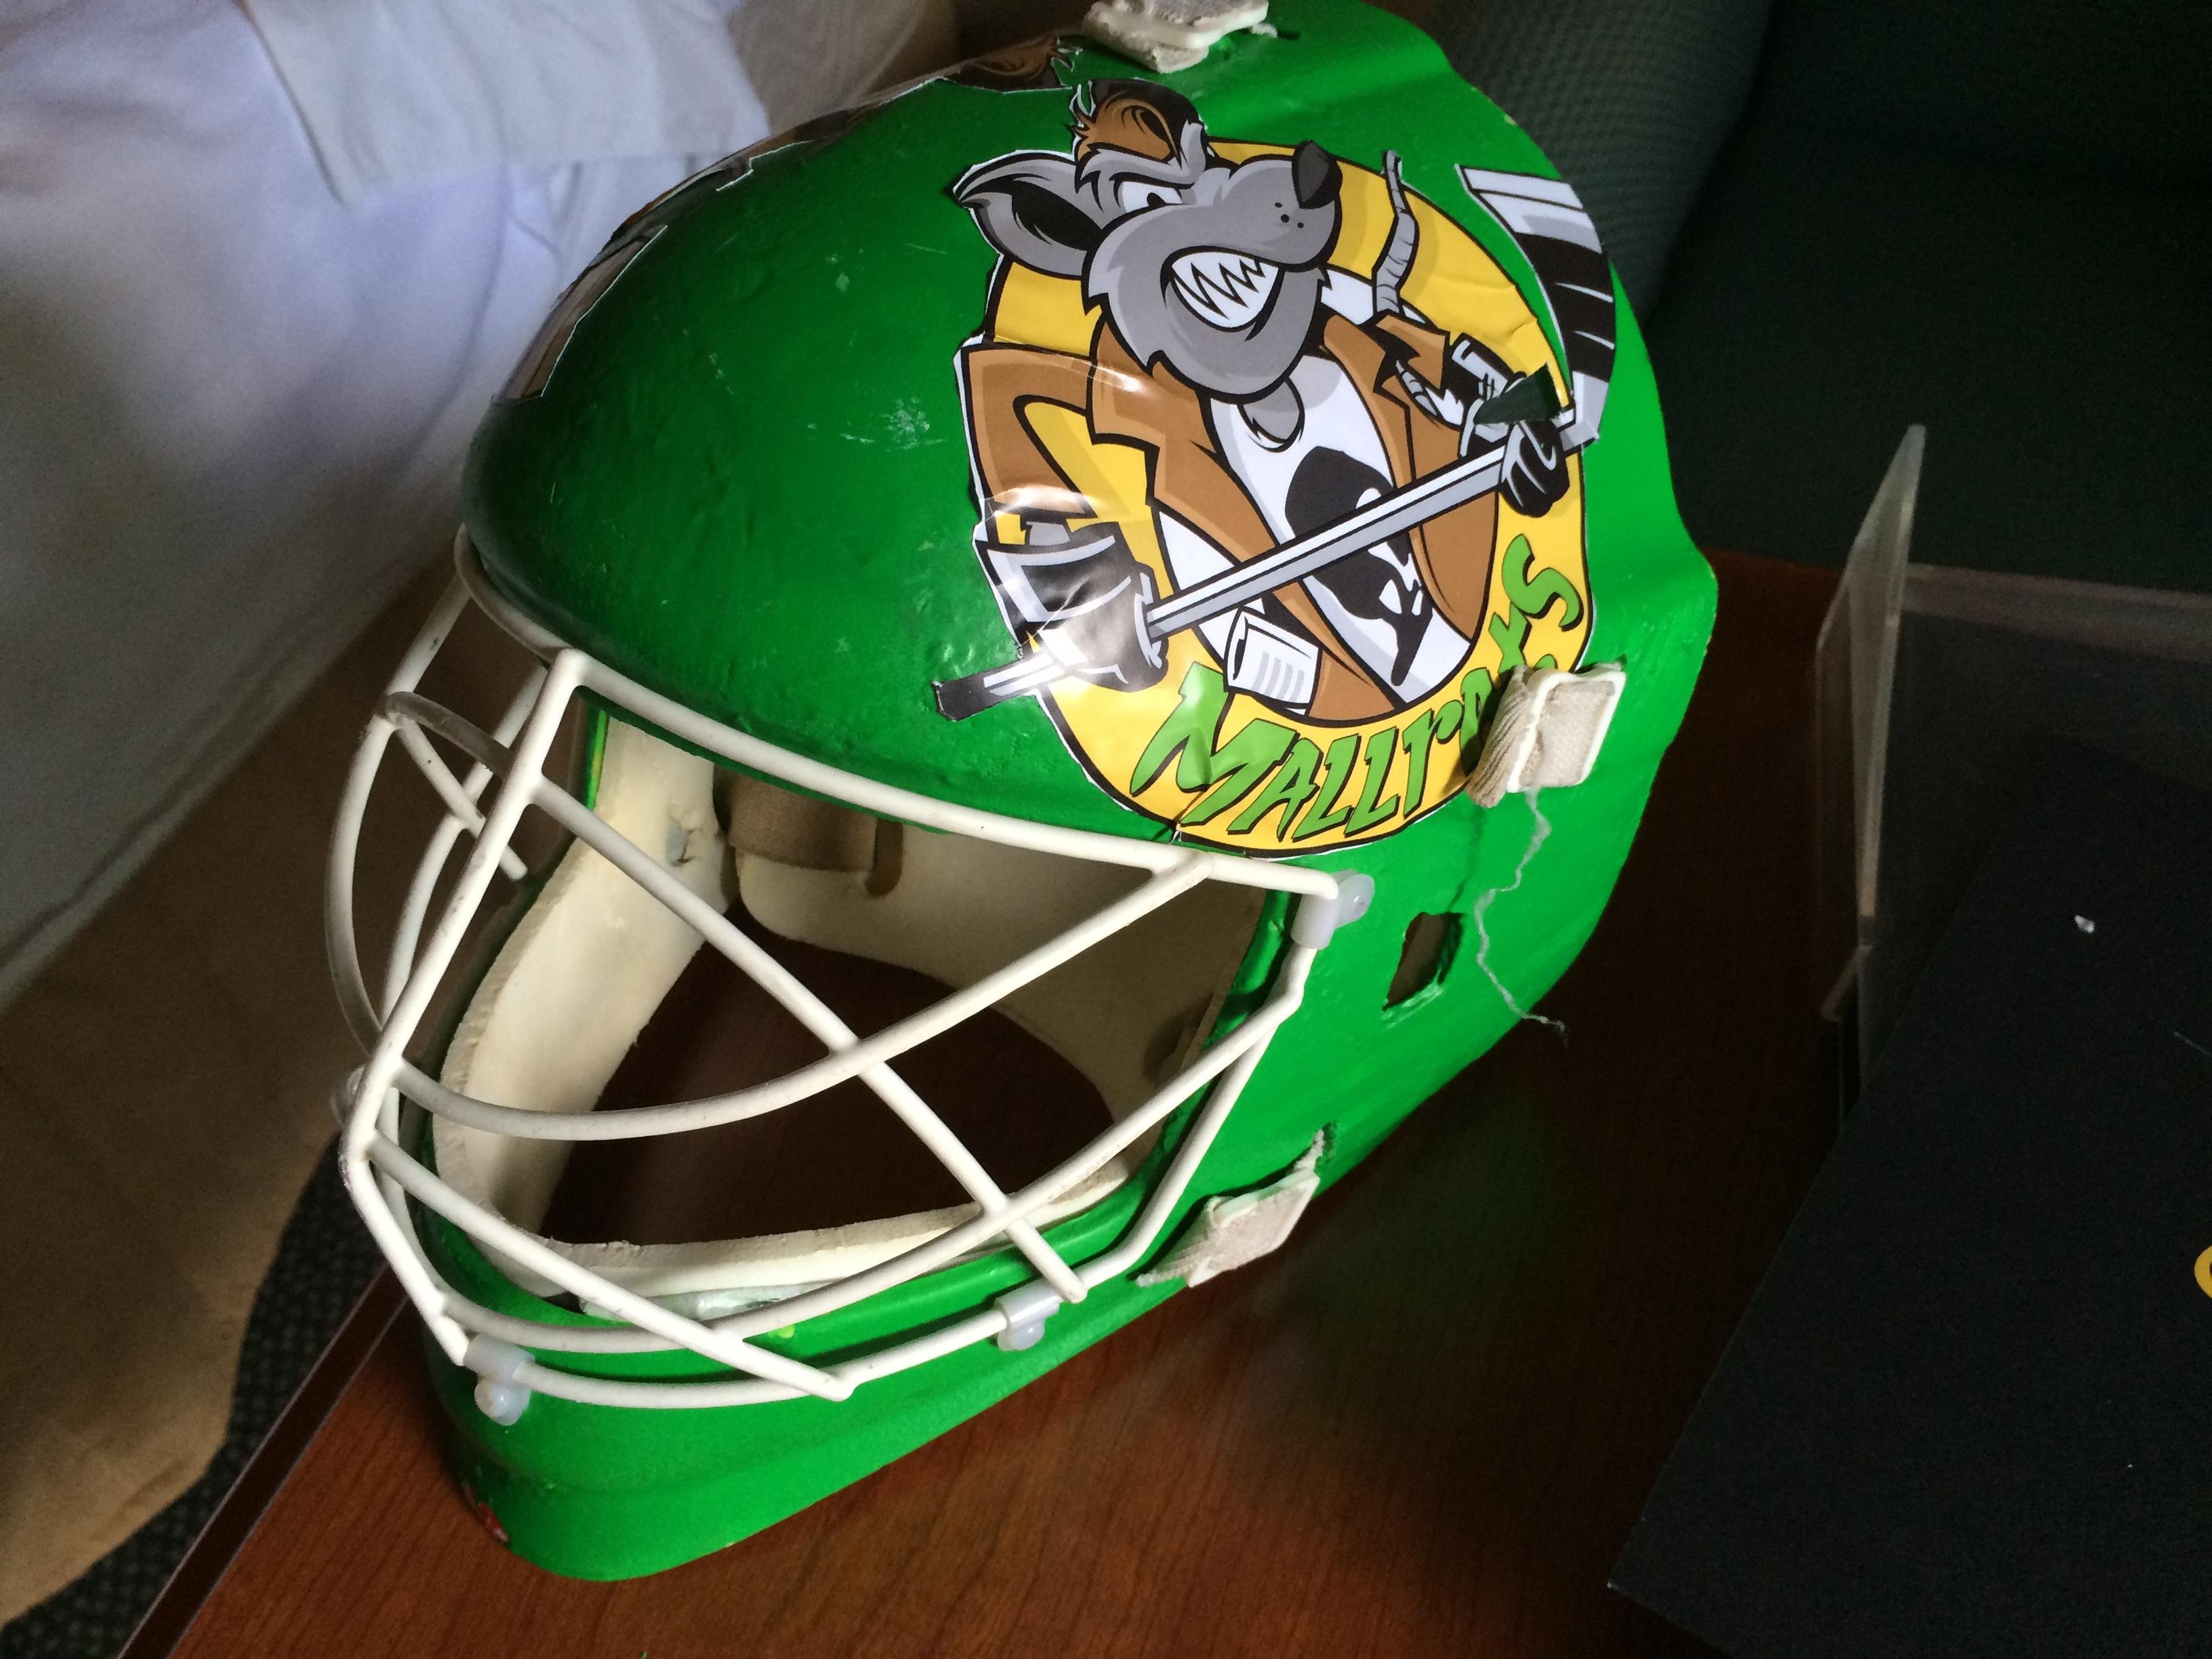 Mallrats Goalie Mask in 2015